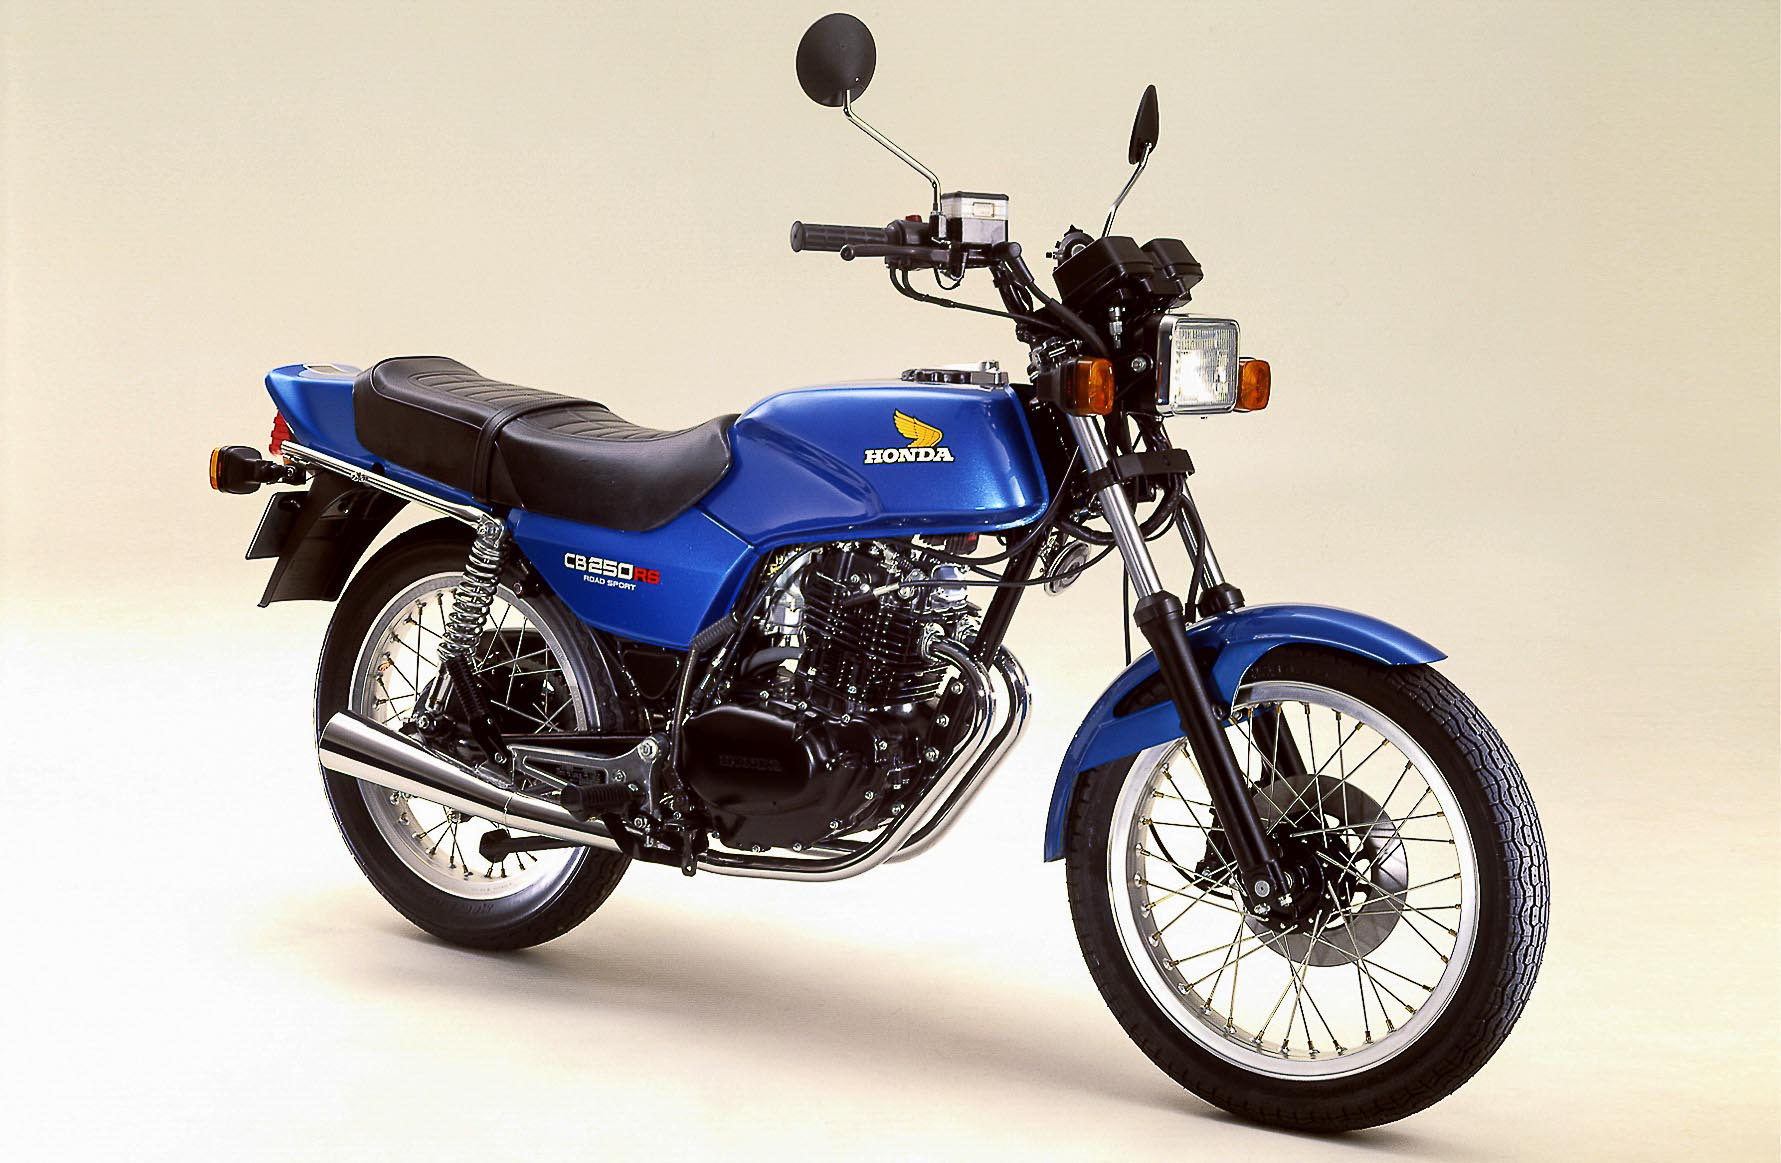 HONDA CB 250RS (1980-1985)